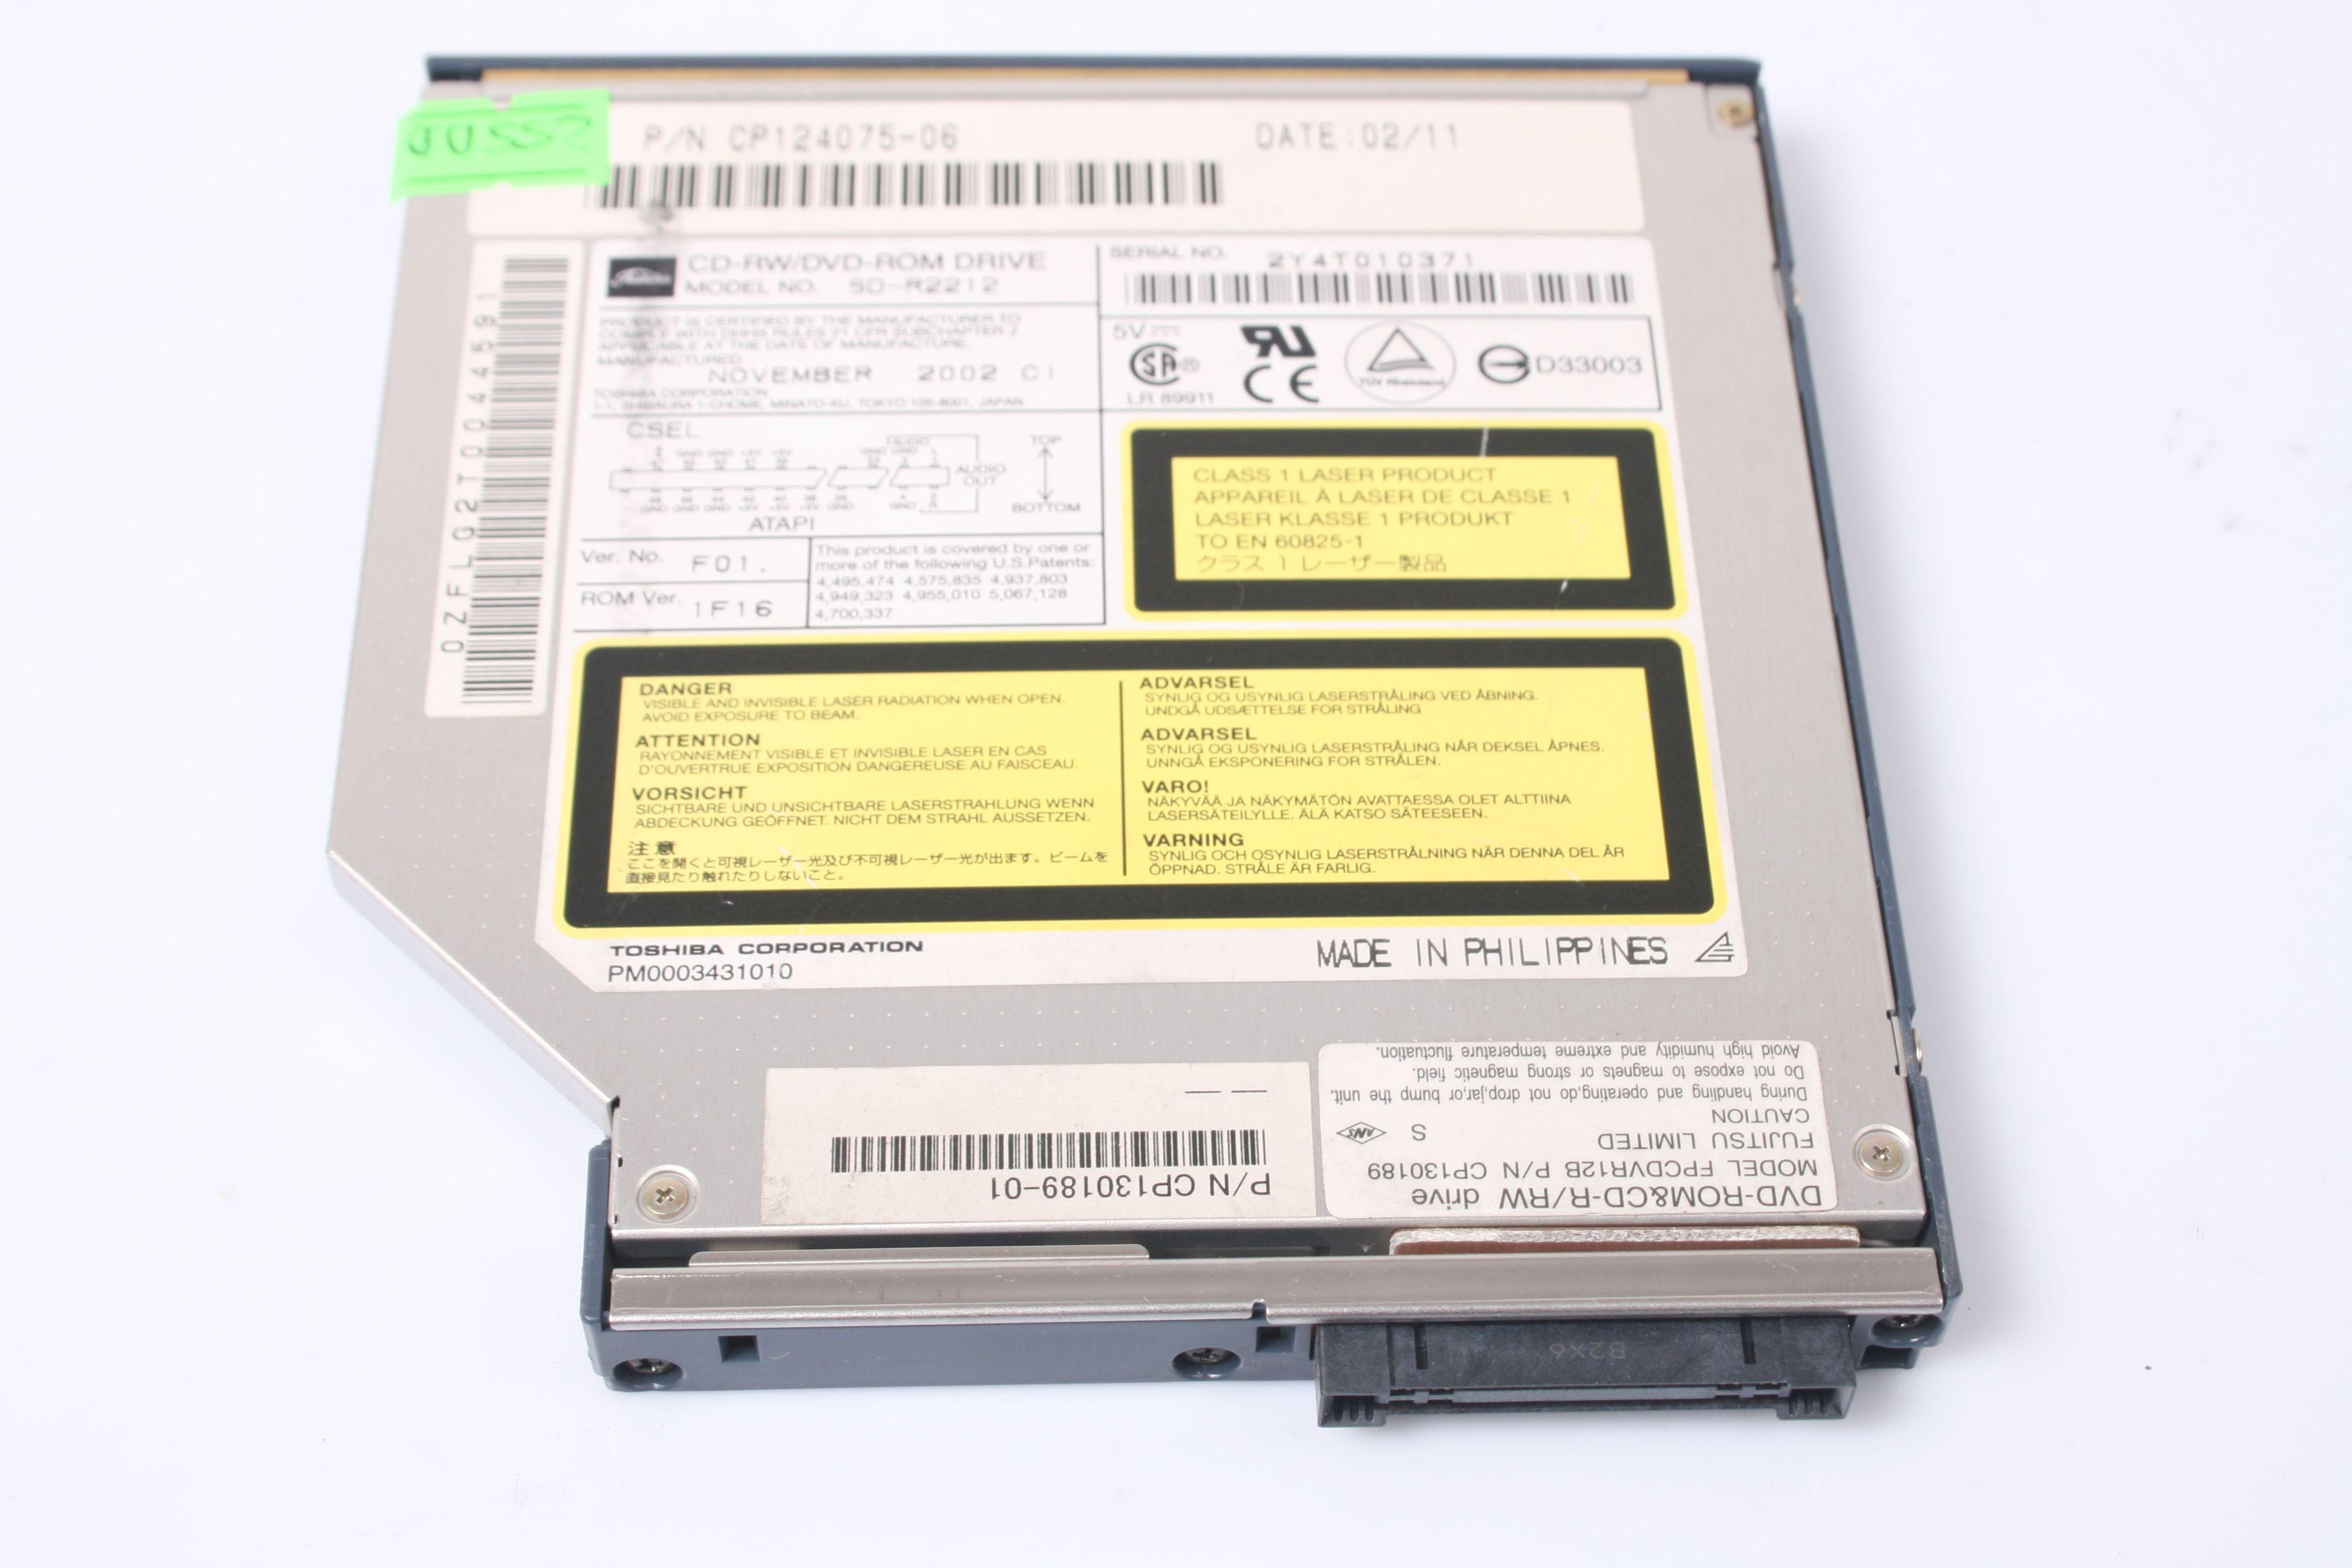 FUJITSU LifeBook S6110 S6120 Optical Drive DVD-ROM CP130189-01 CP124075-06